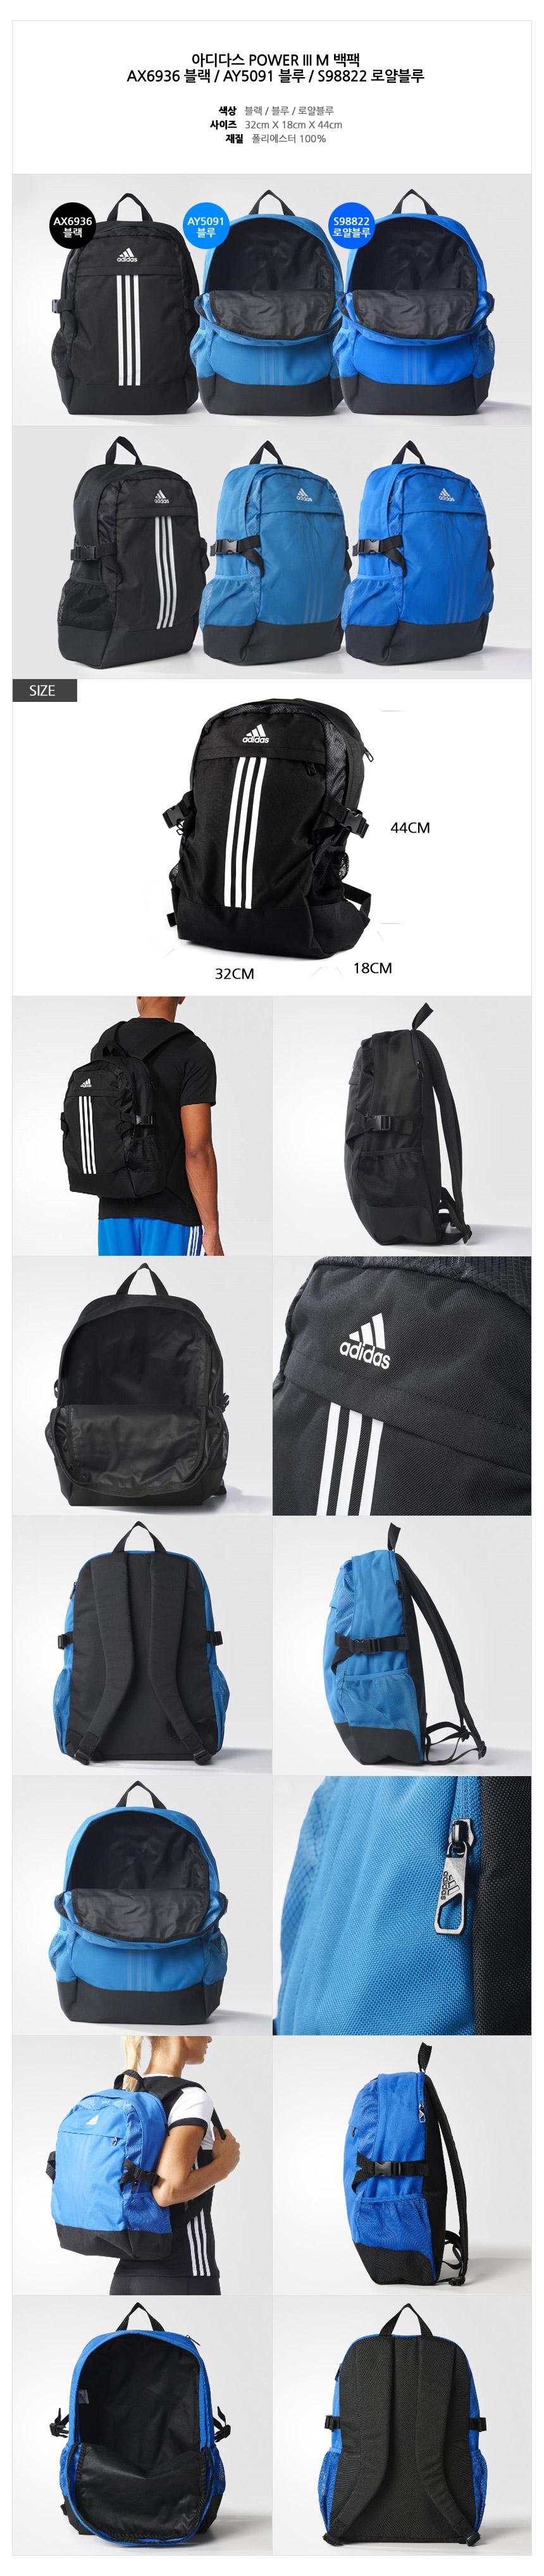 eab3171ea6b0 Nike Adidas Sports Bags Backpack Student Bag Duffle Bag - 11STREET